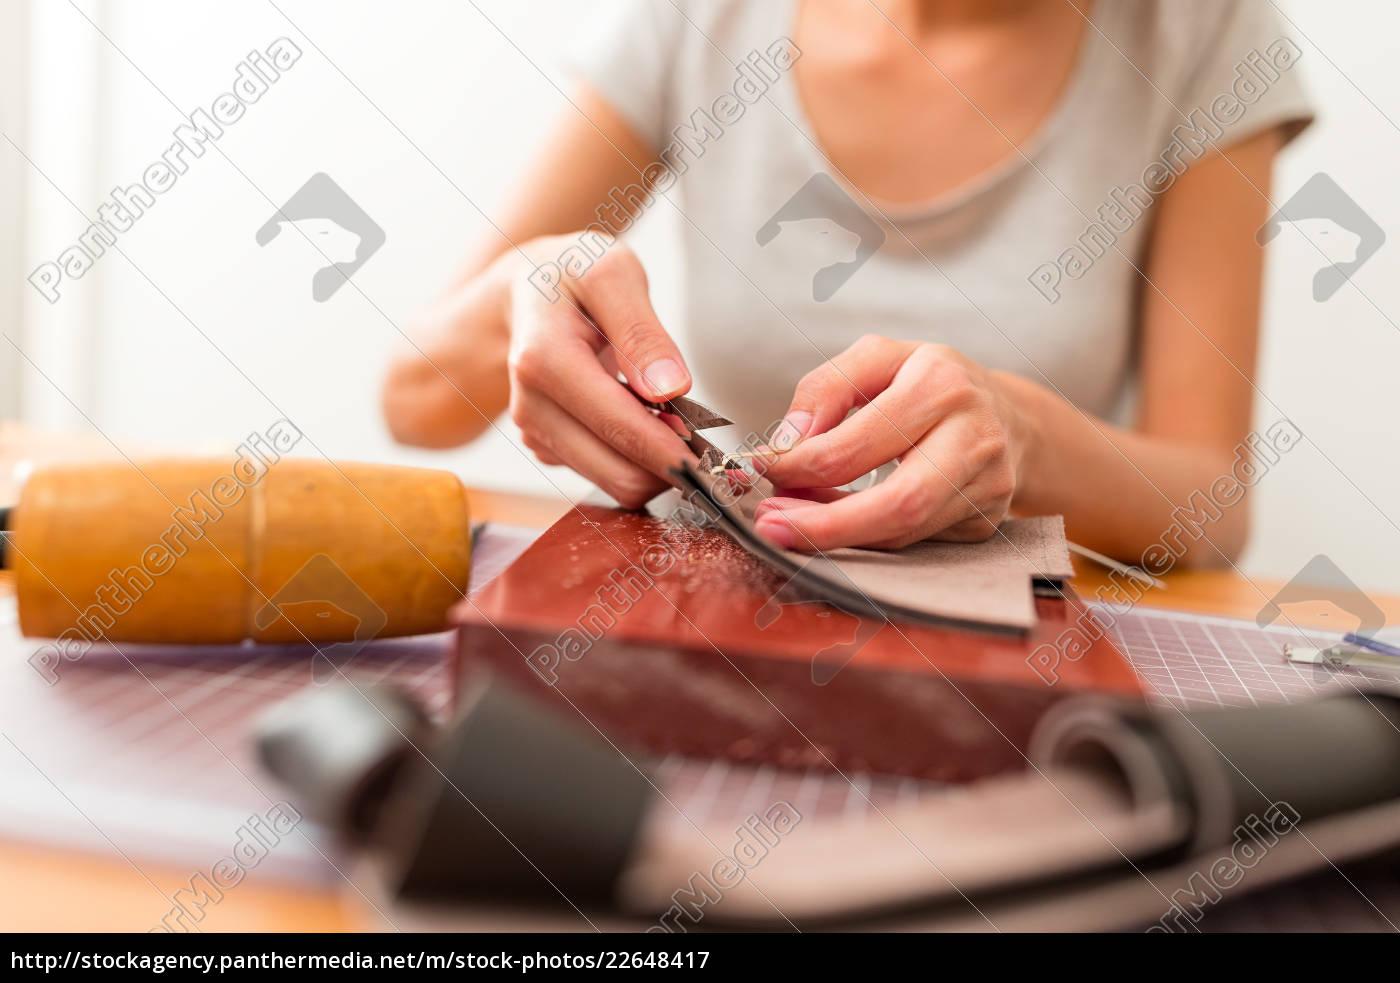 leather, craft, workshop - 22648417